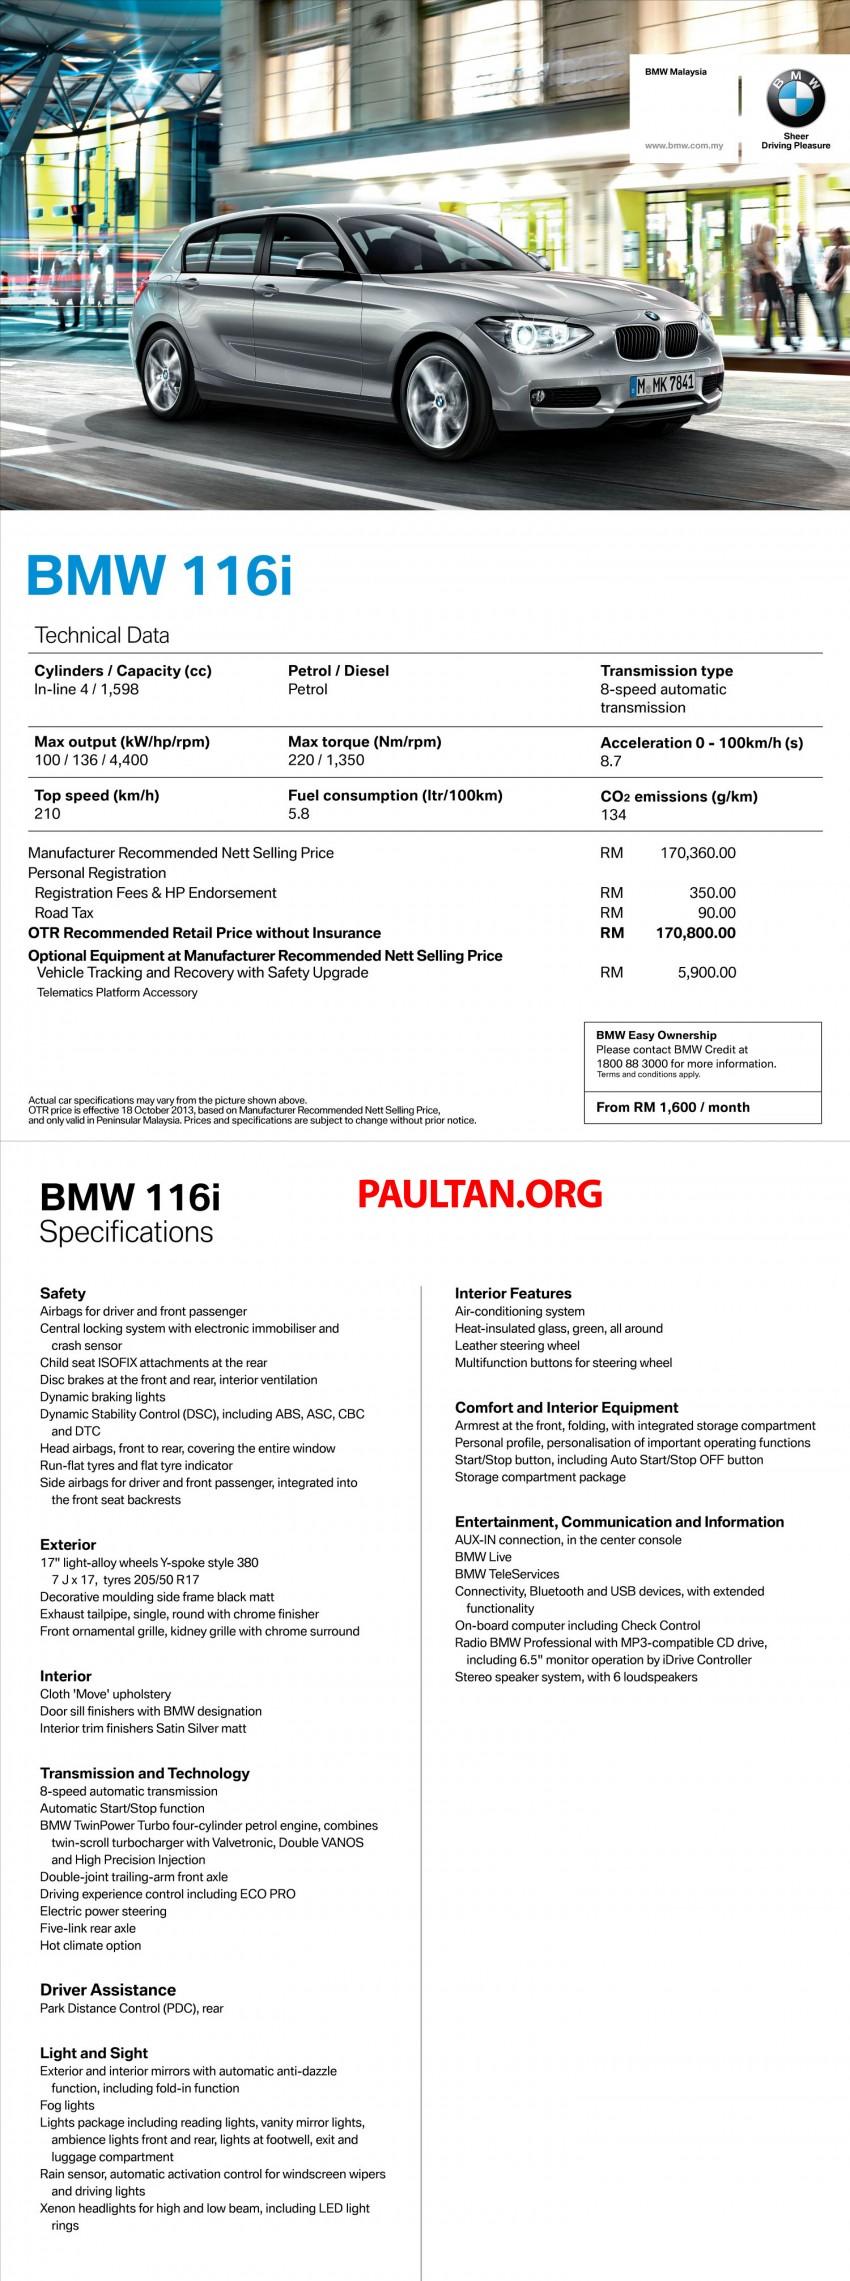 BMW 1 Series (F20) launched in Malaysia – 116i, 118i Sport/Urban, 125i Sport/M Sport, RM171k-254k Image #205394